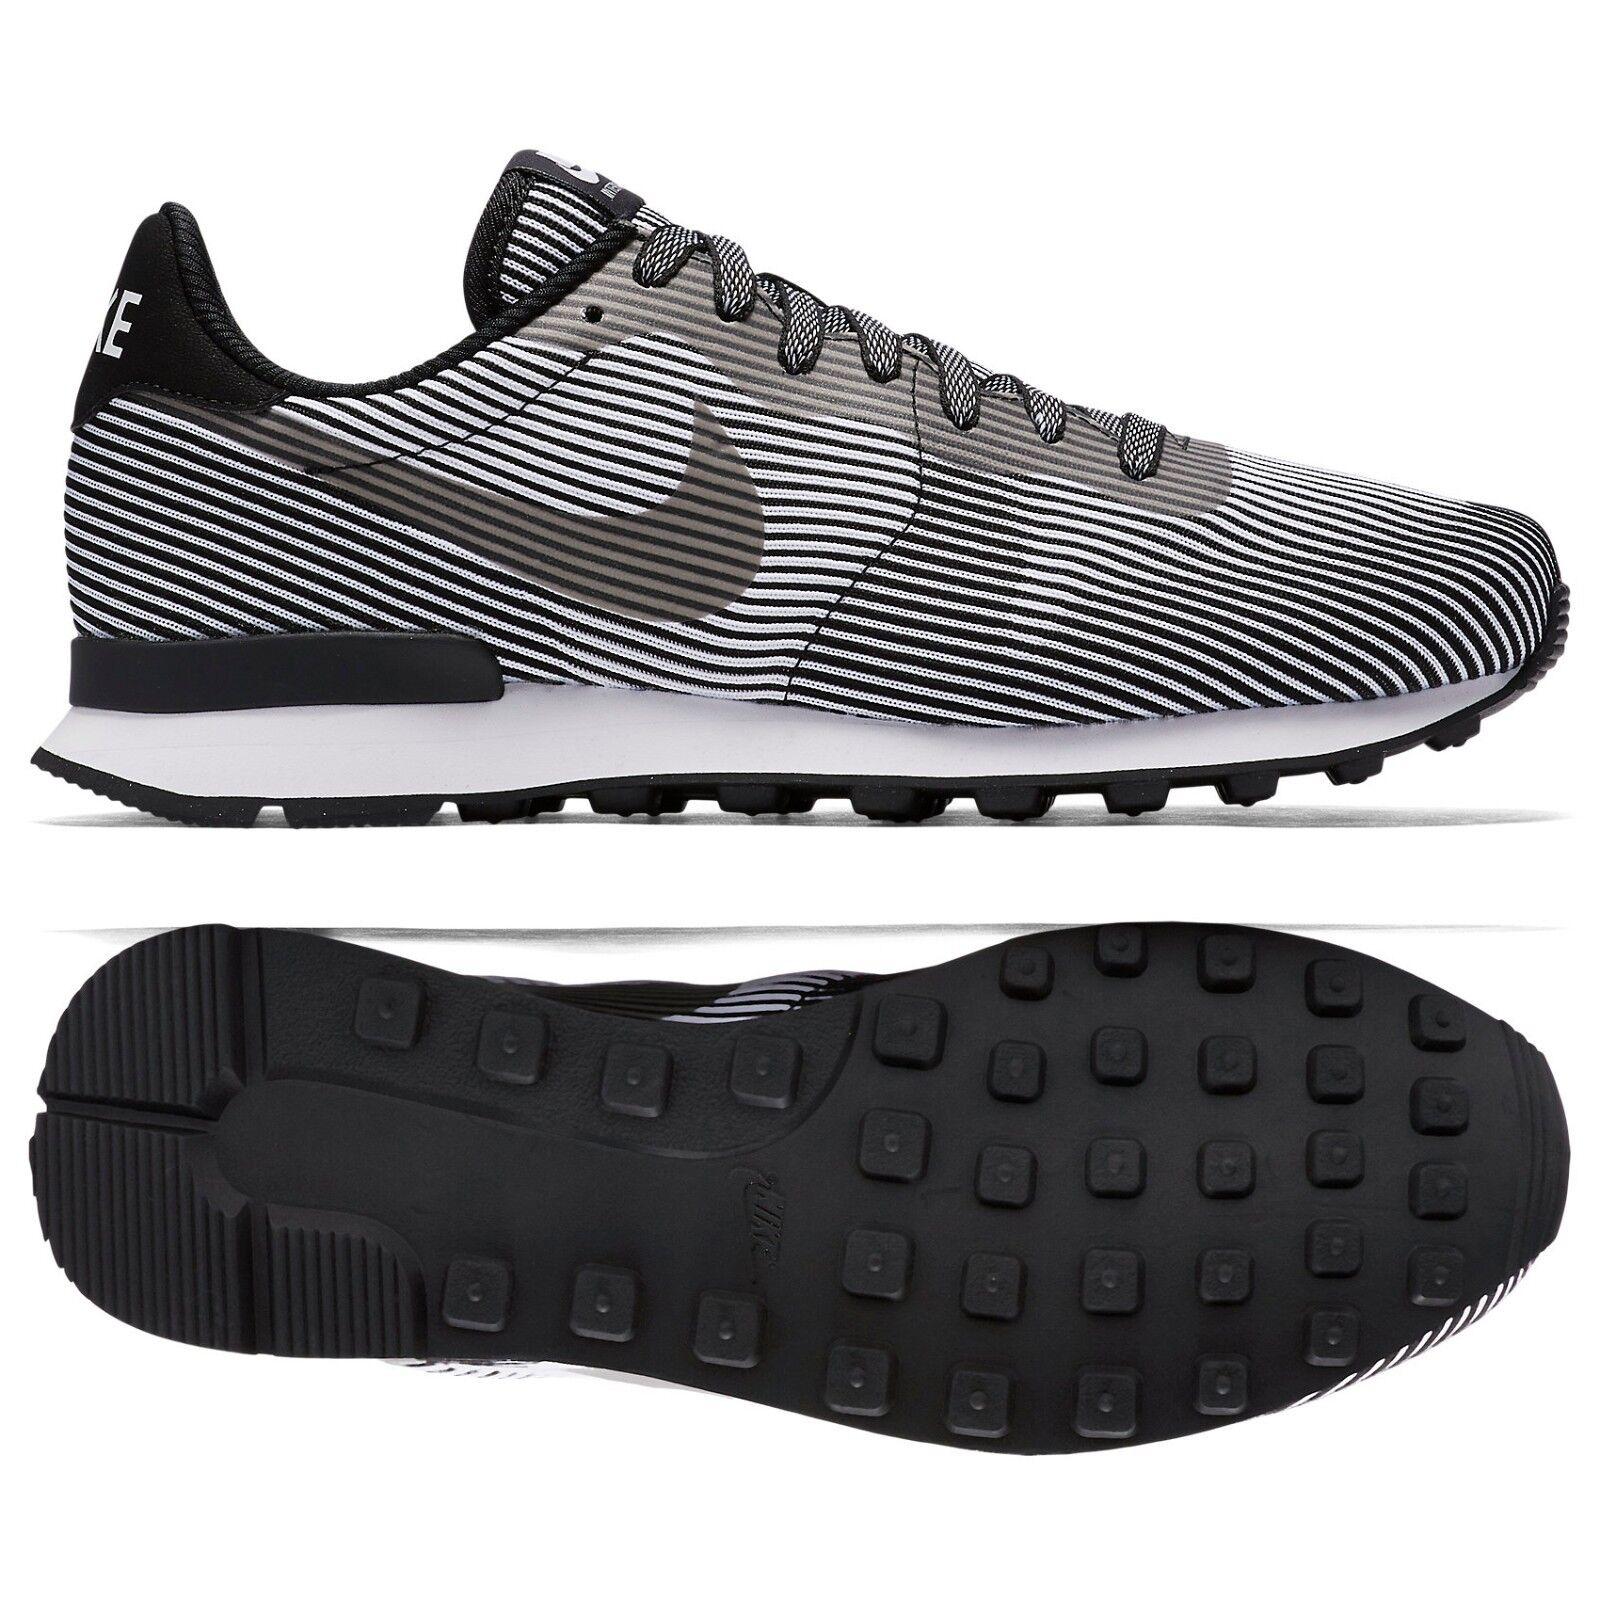 Nike Internationalist Knit Jacquard Moire KJCRD M QS 829344-001 Black Men shoes